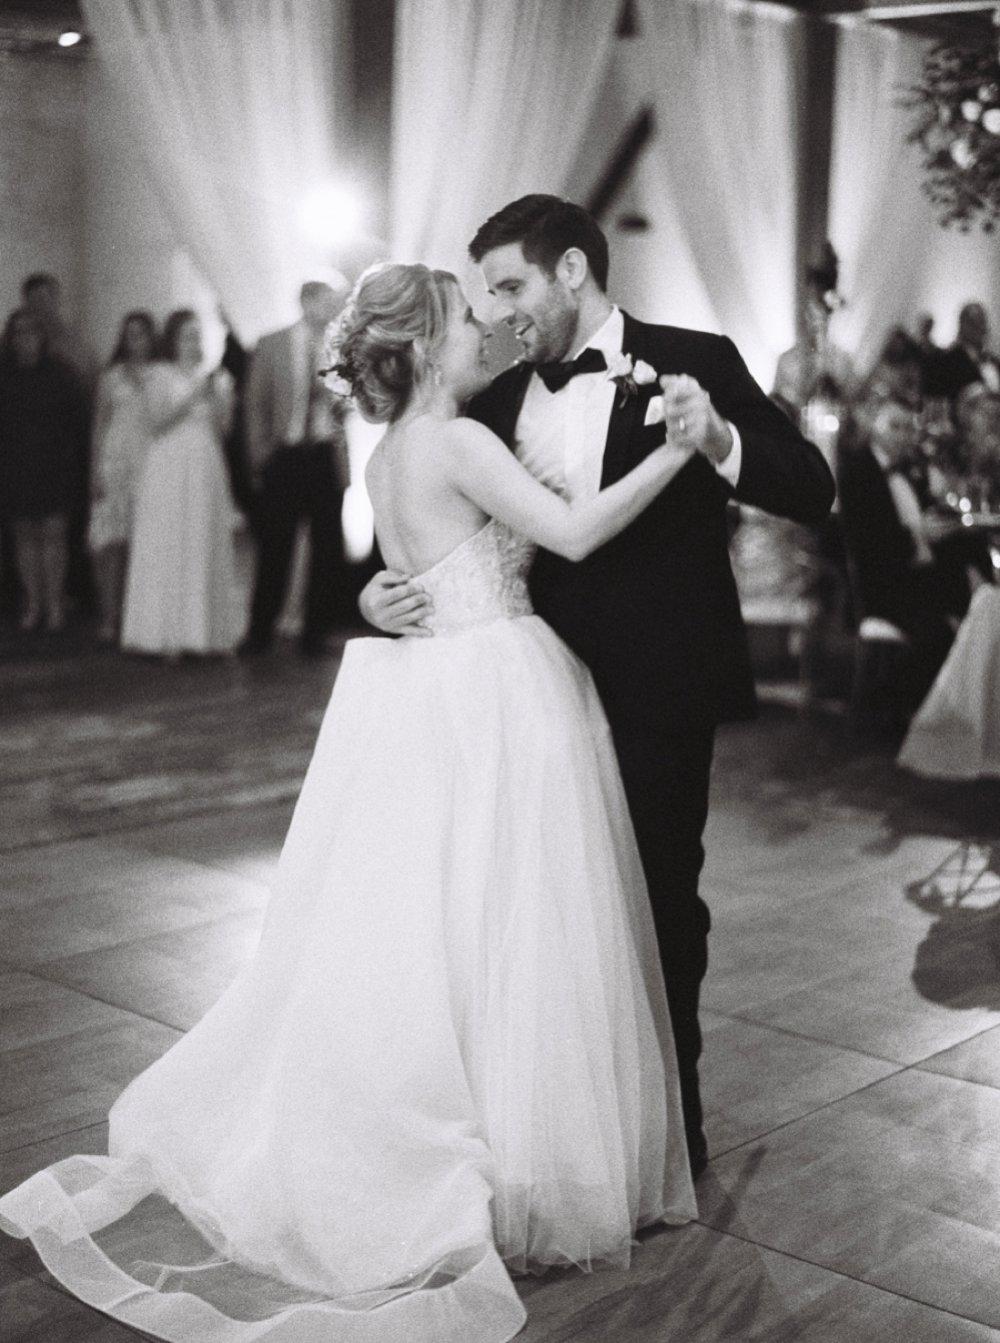 austin wedding photographer jenna mcelroyjpg